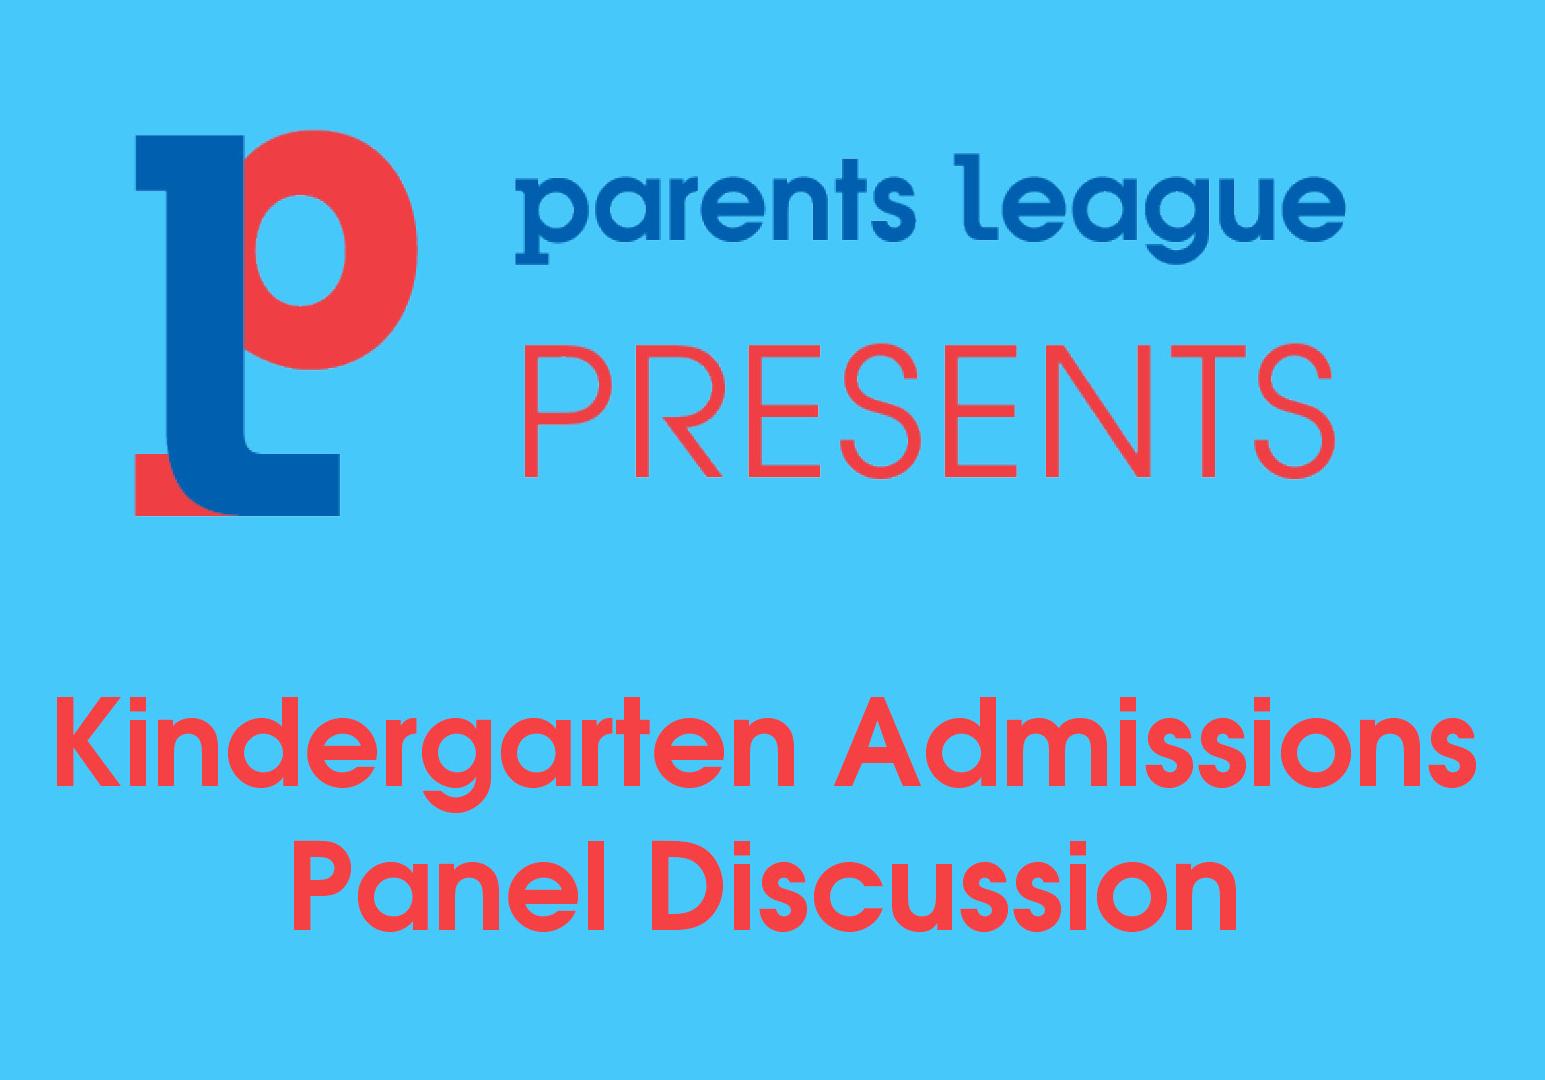 Kindergarten Admissions Panel Discussion 2021